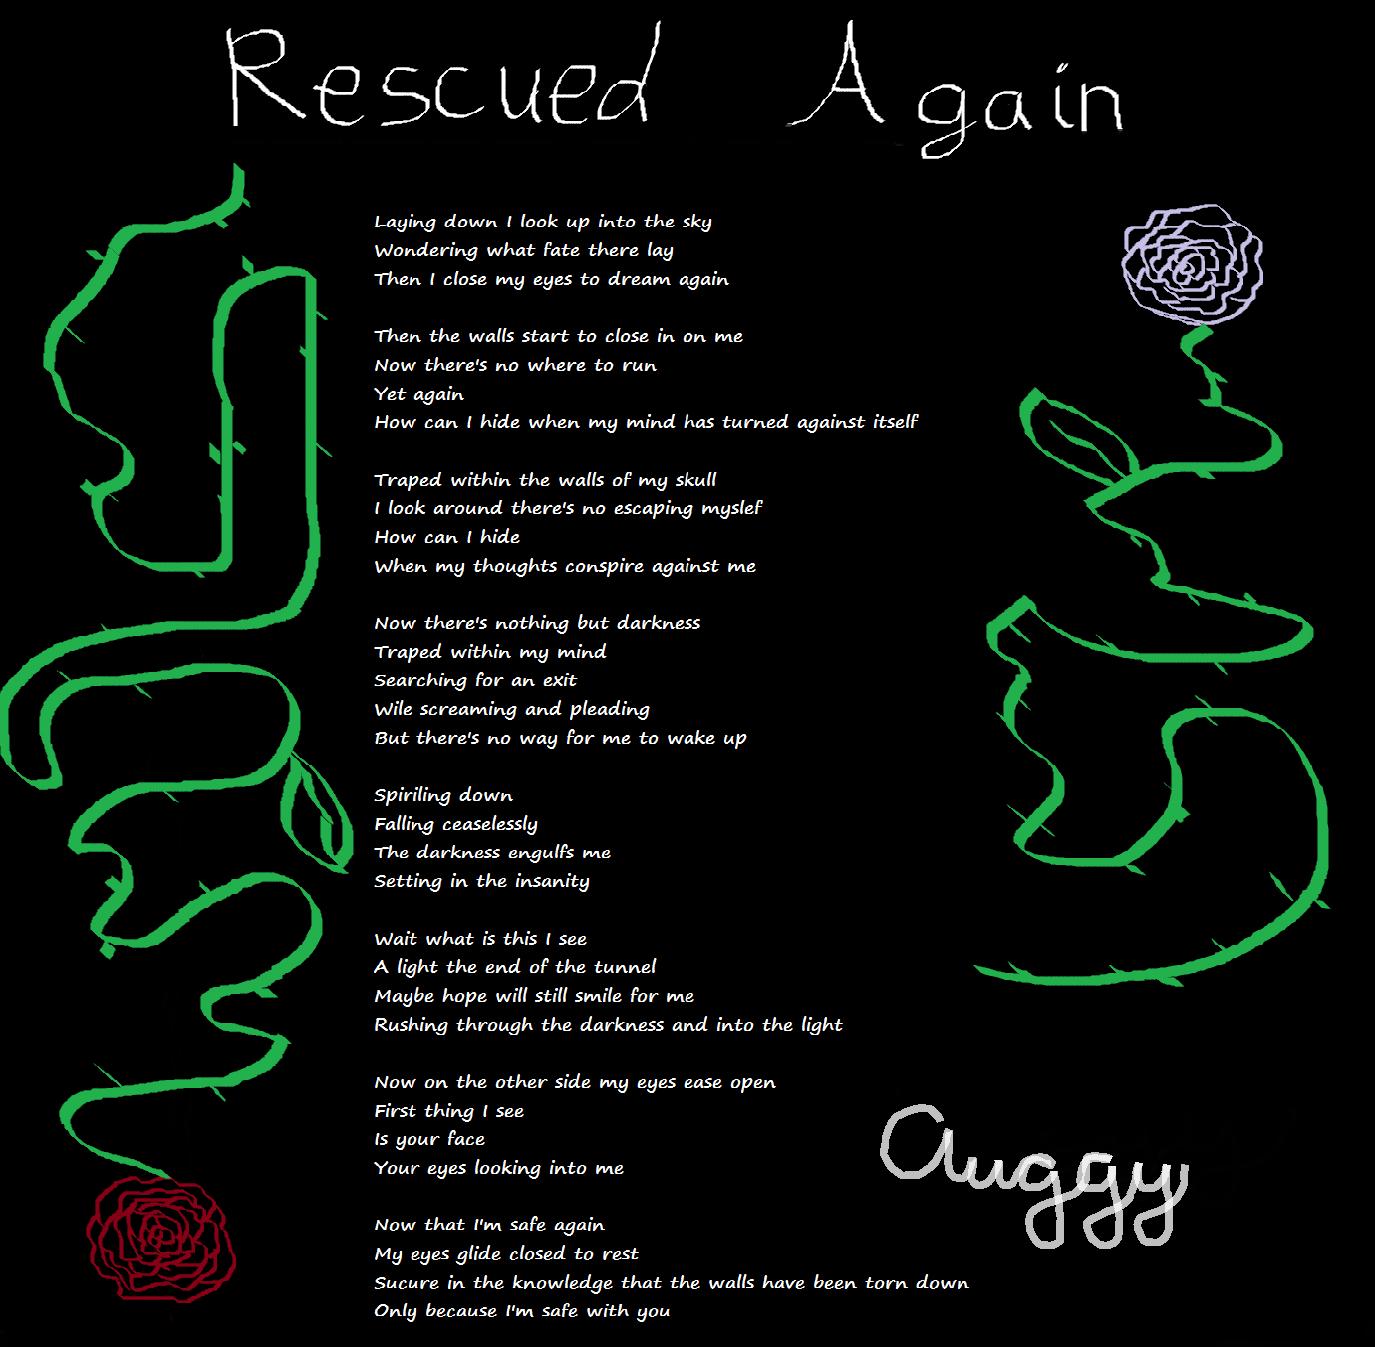 Rescued Again